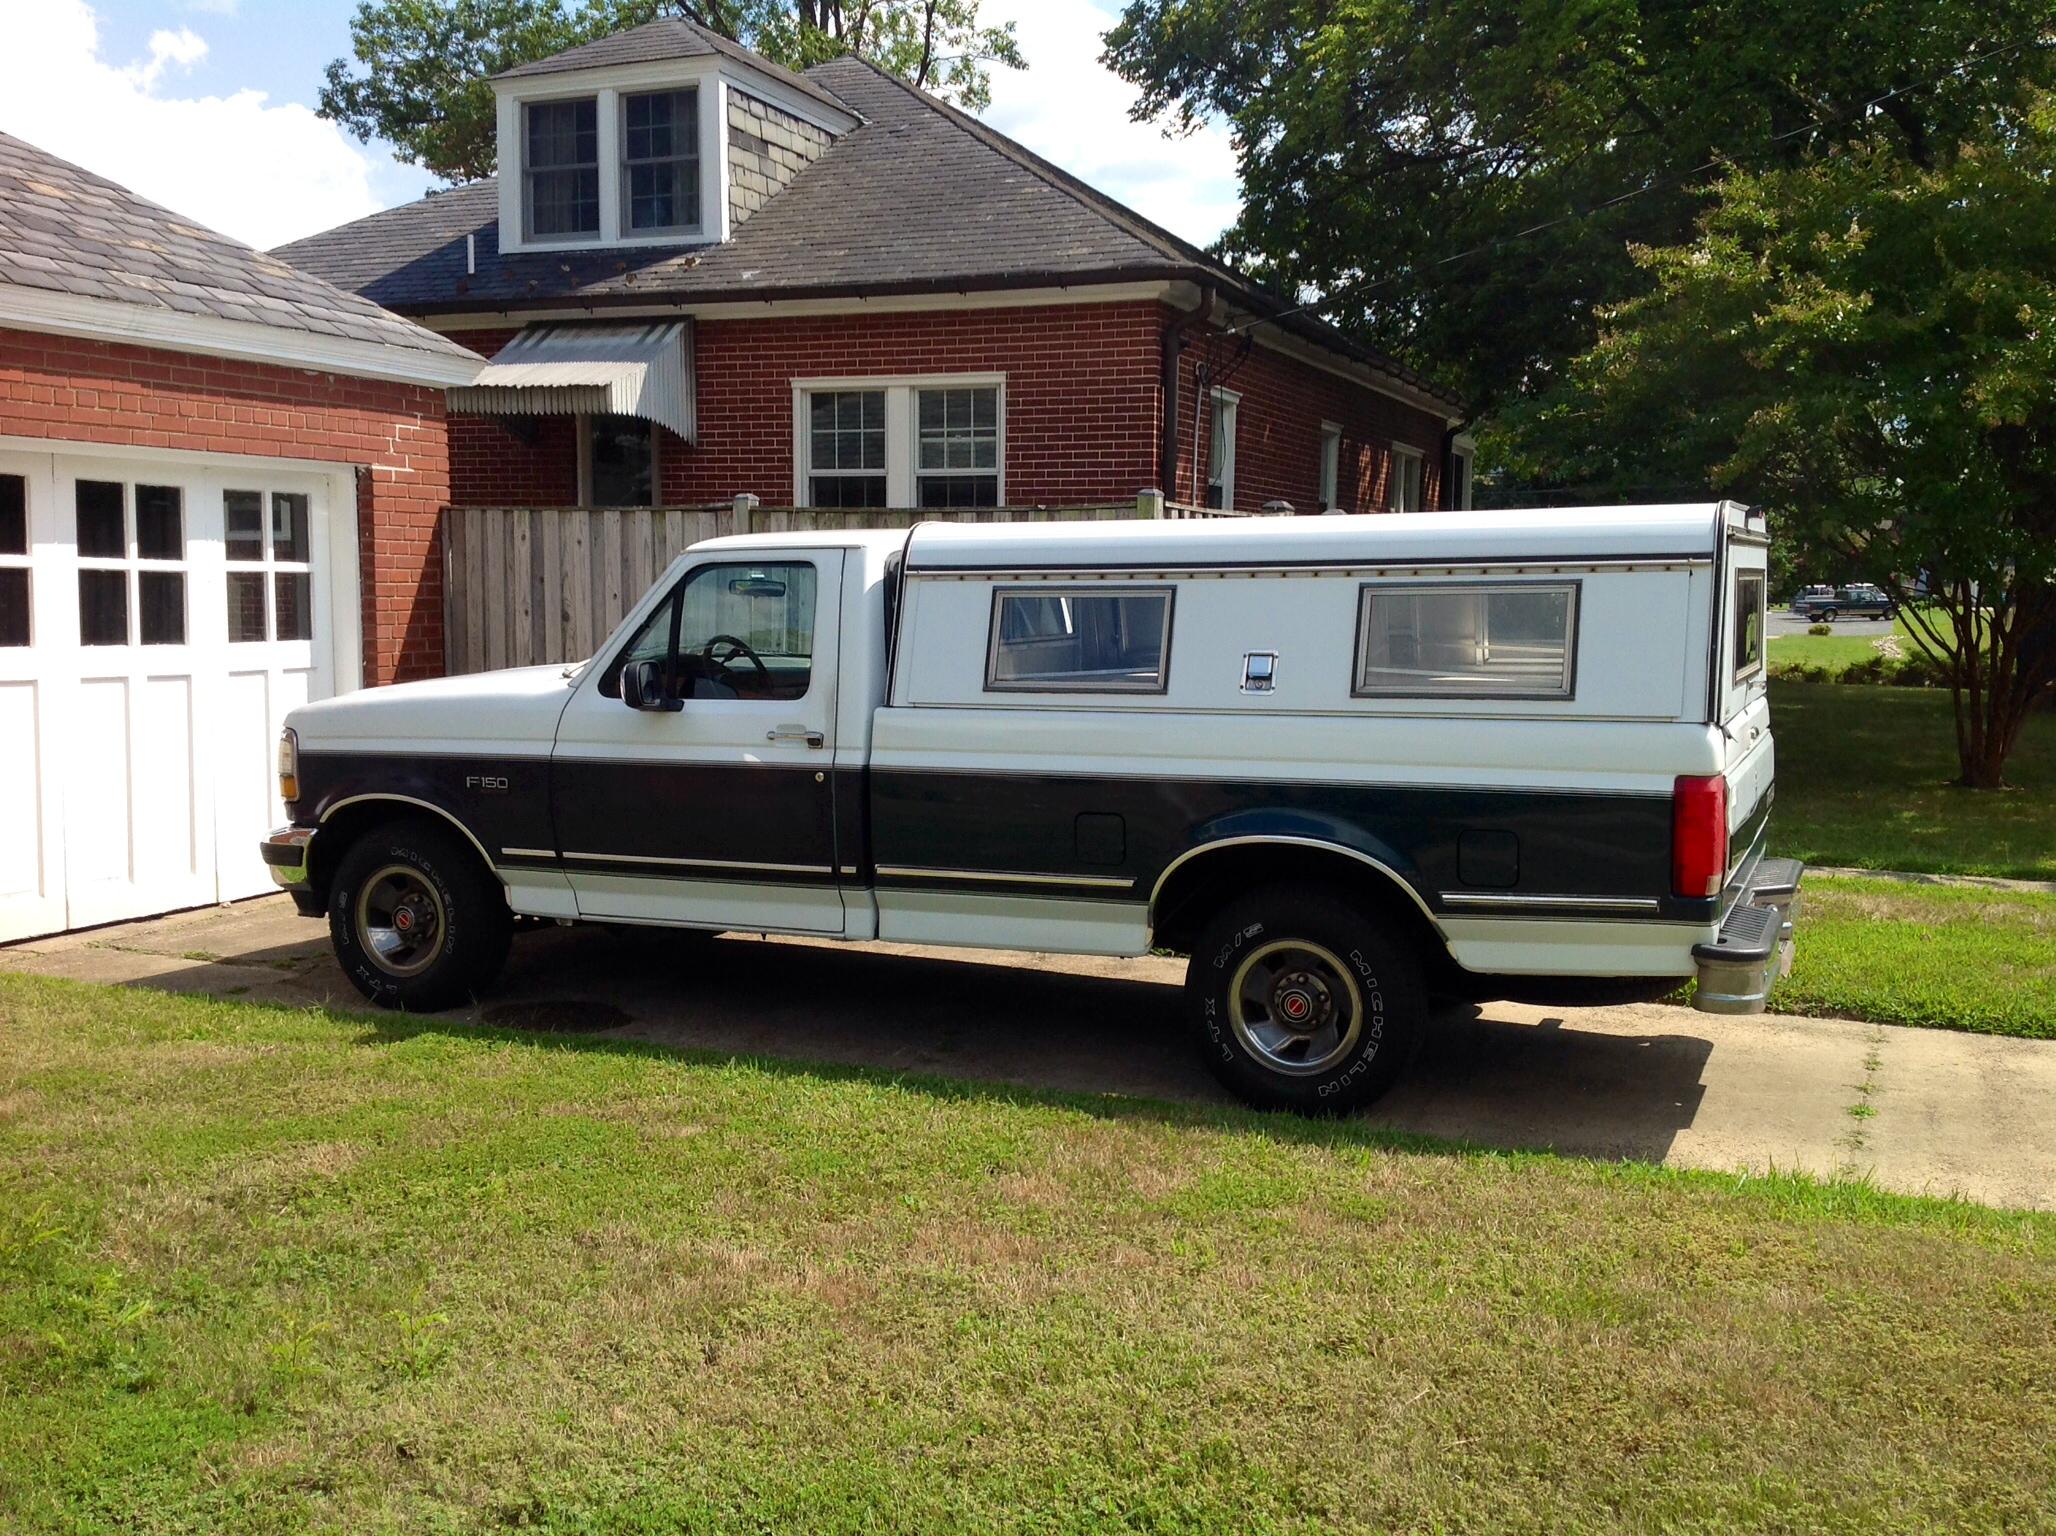 Barbara's 1993 Ford truck